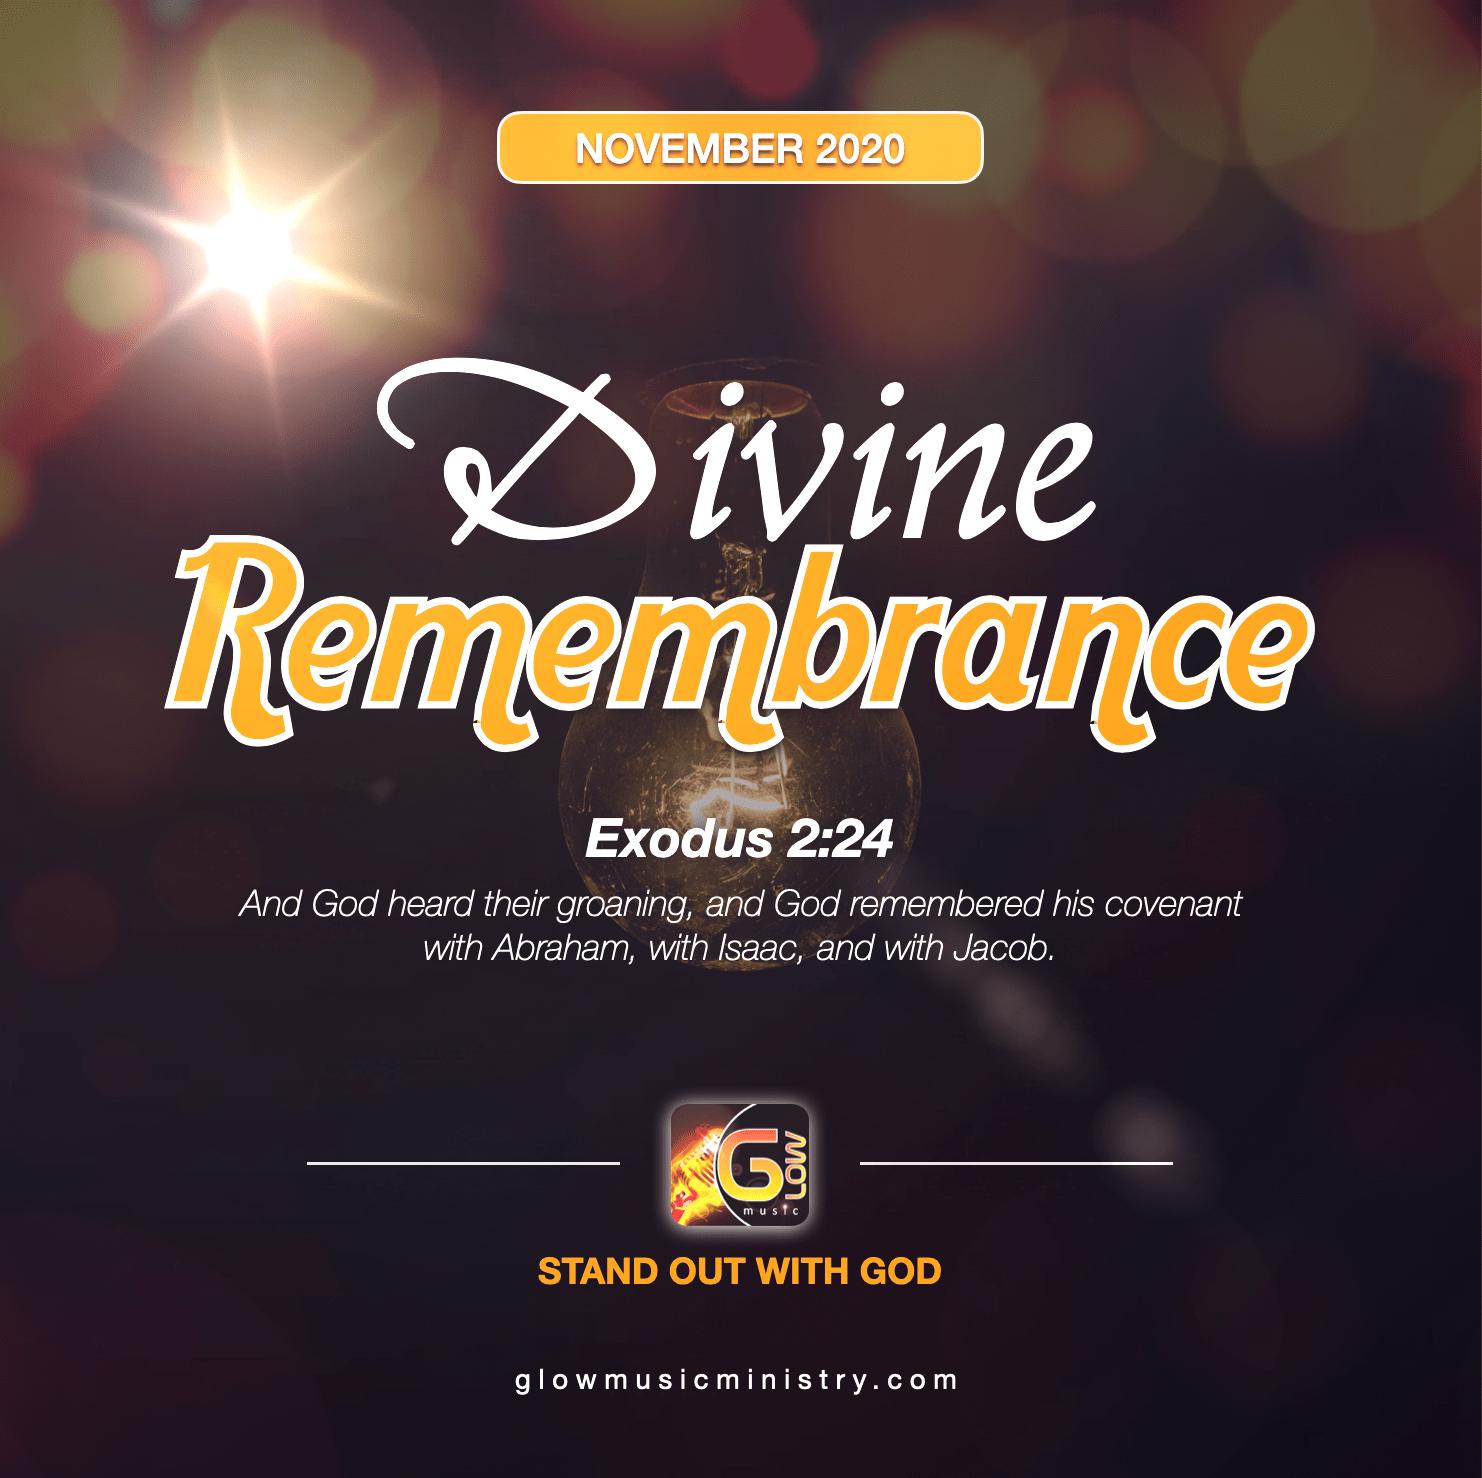 November 2020 - Divine Remembrance